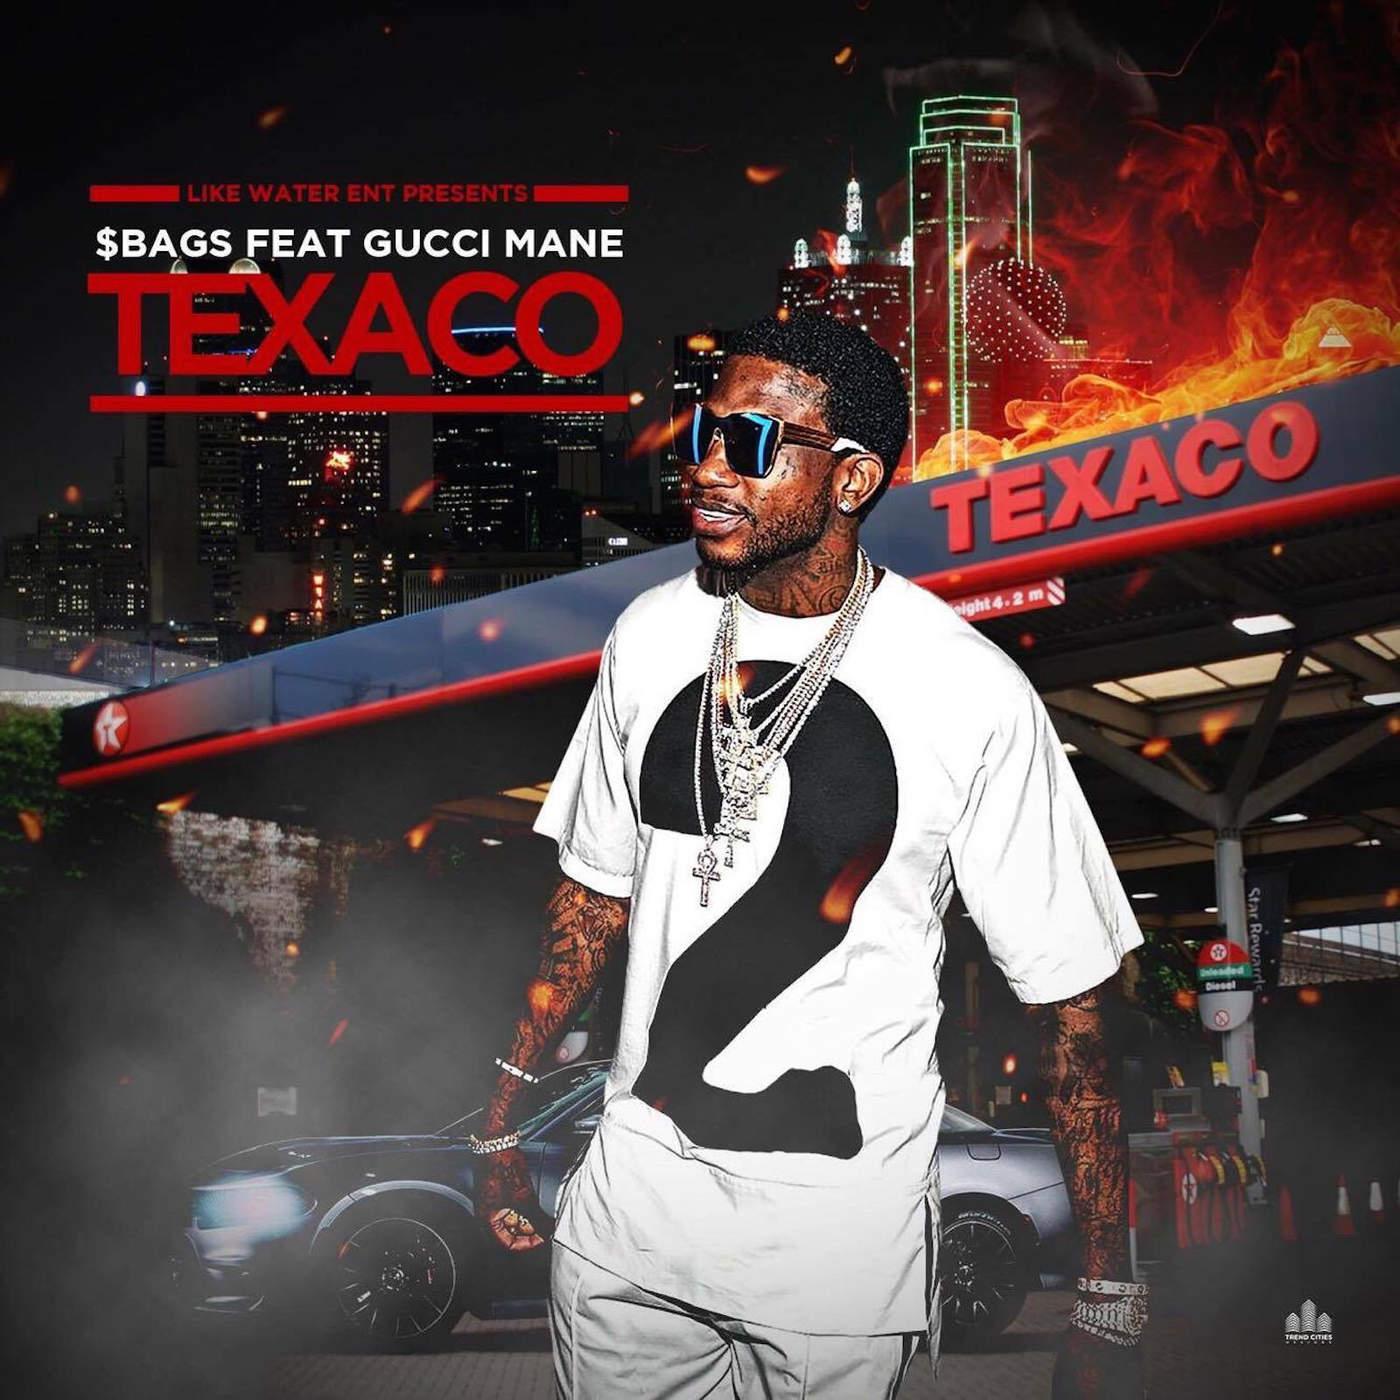 $Bags - Texaco (feat. Gucci Mane) - Single Cover